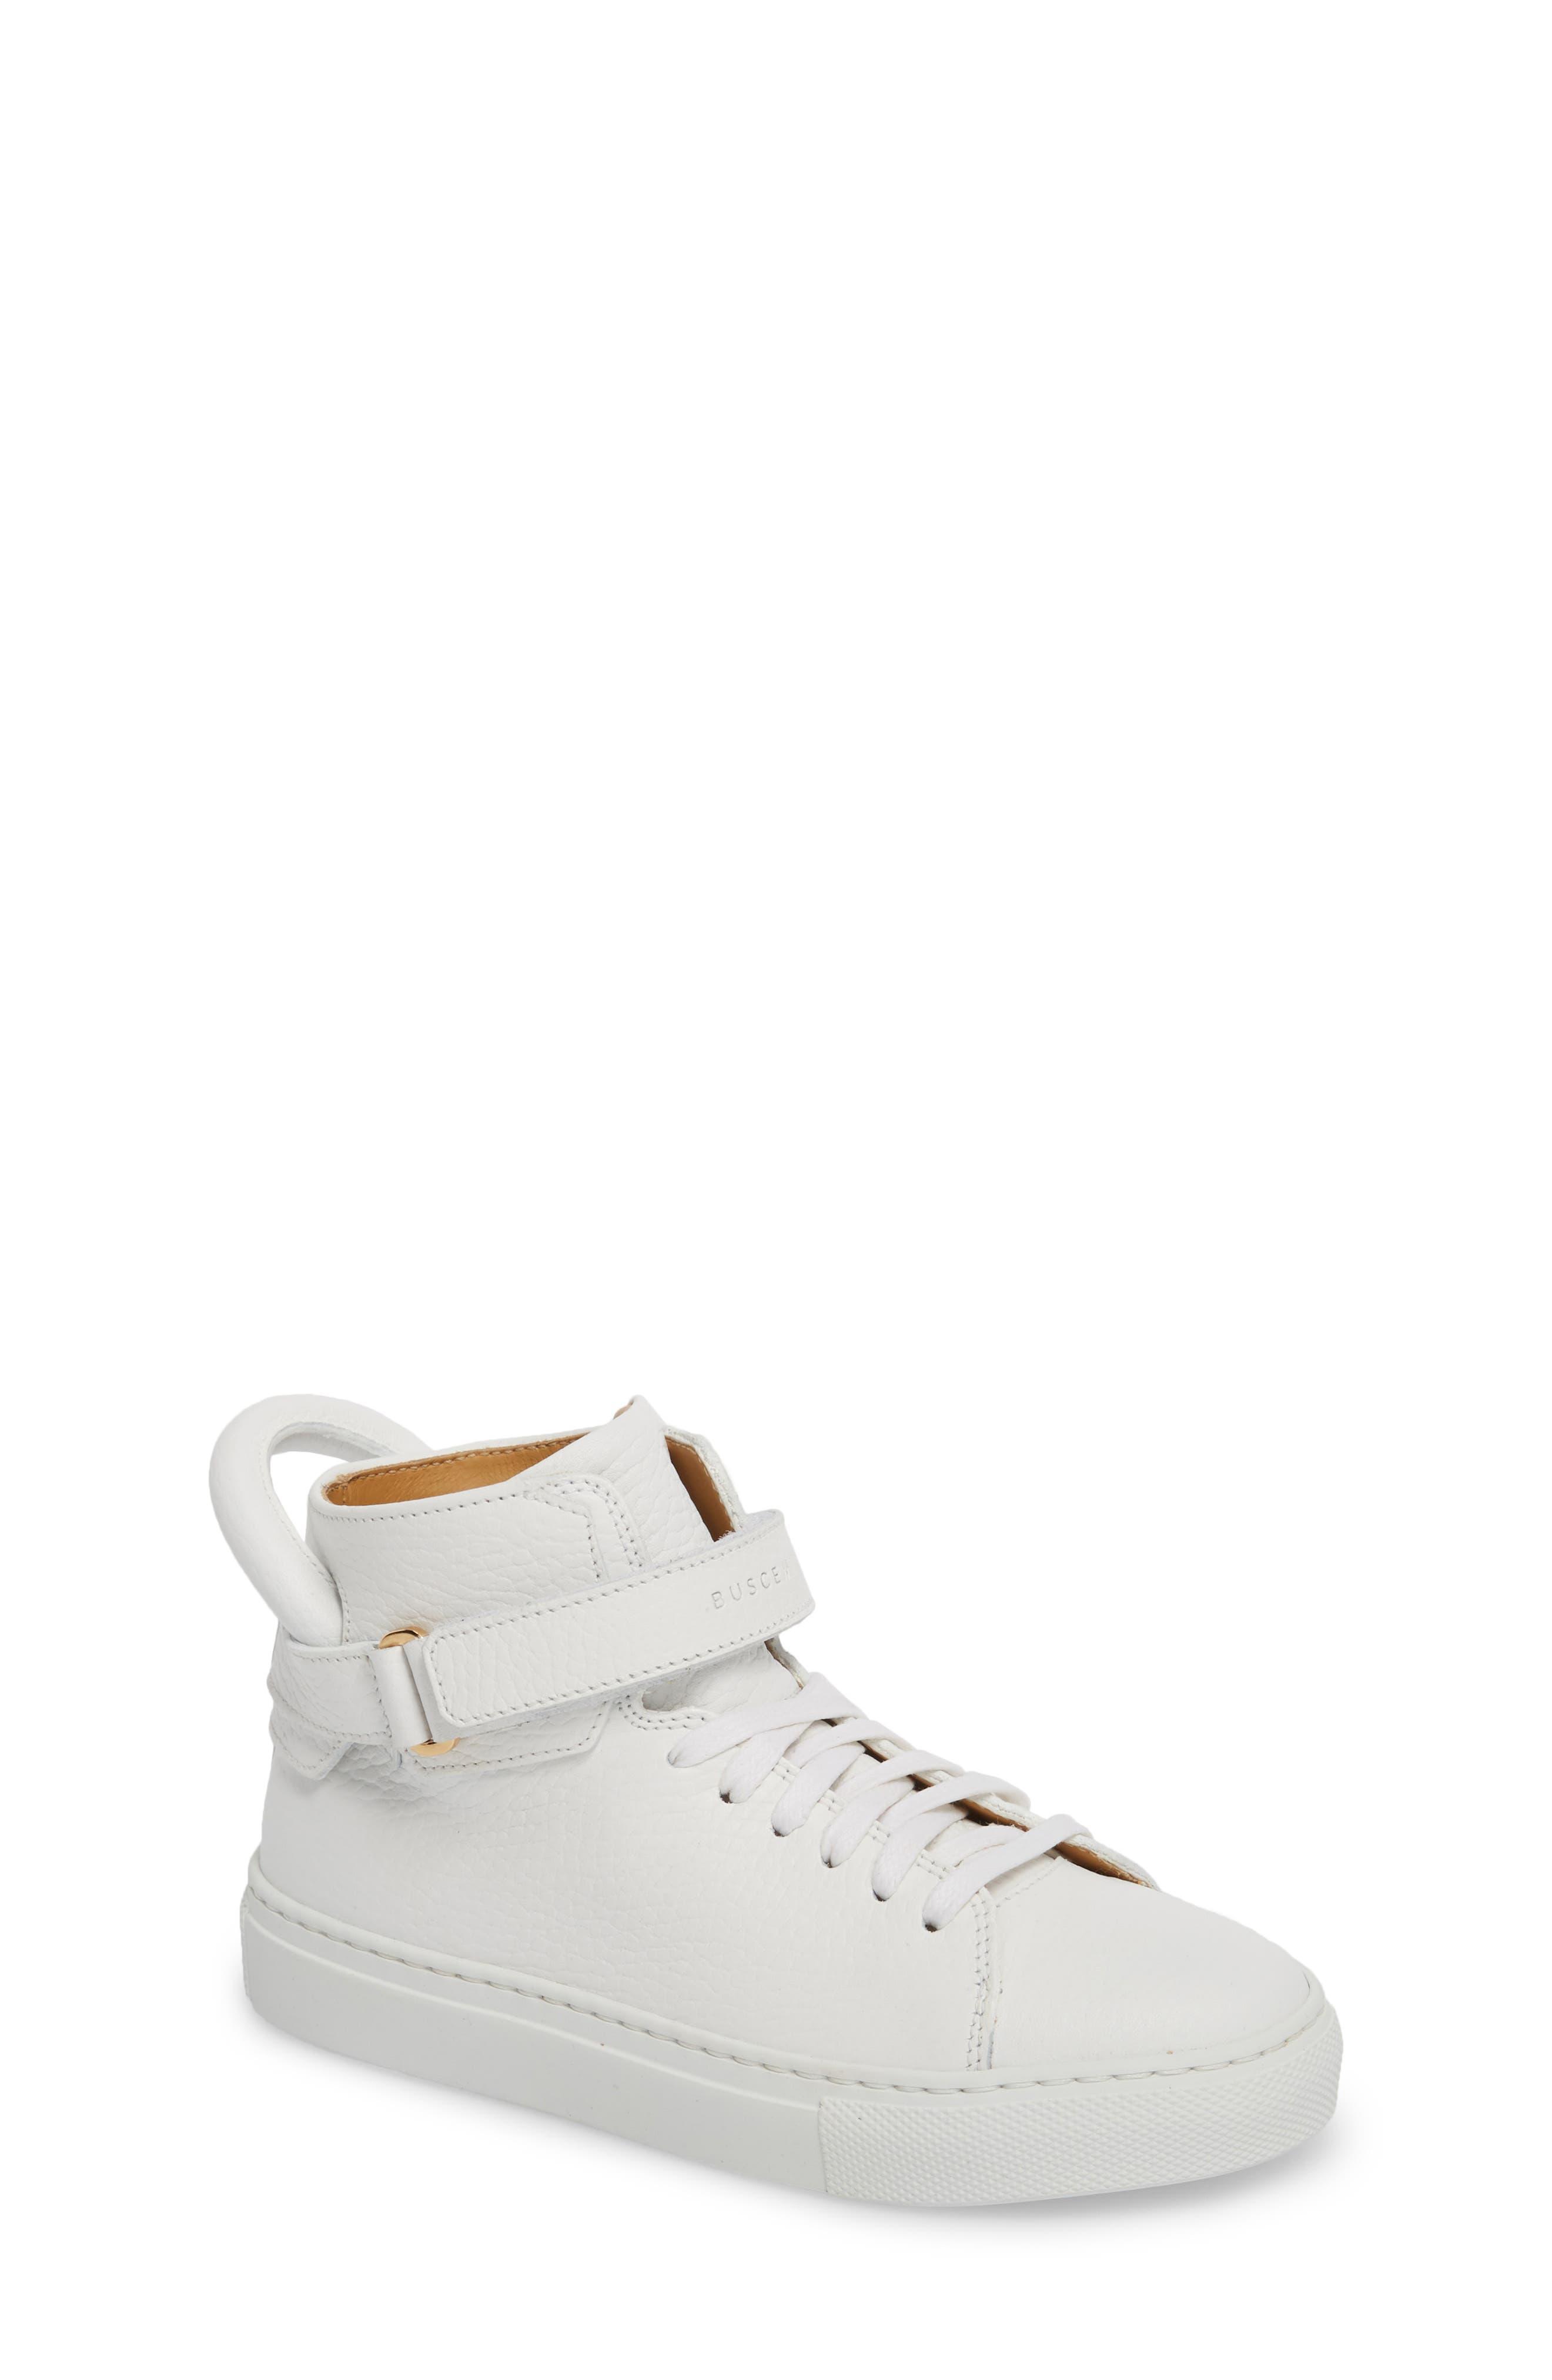 High Top Sneaker,                         Main,                         color, 100